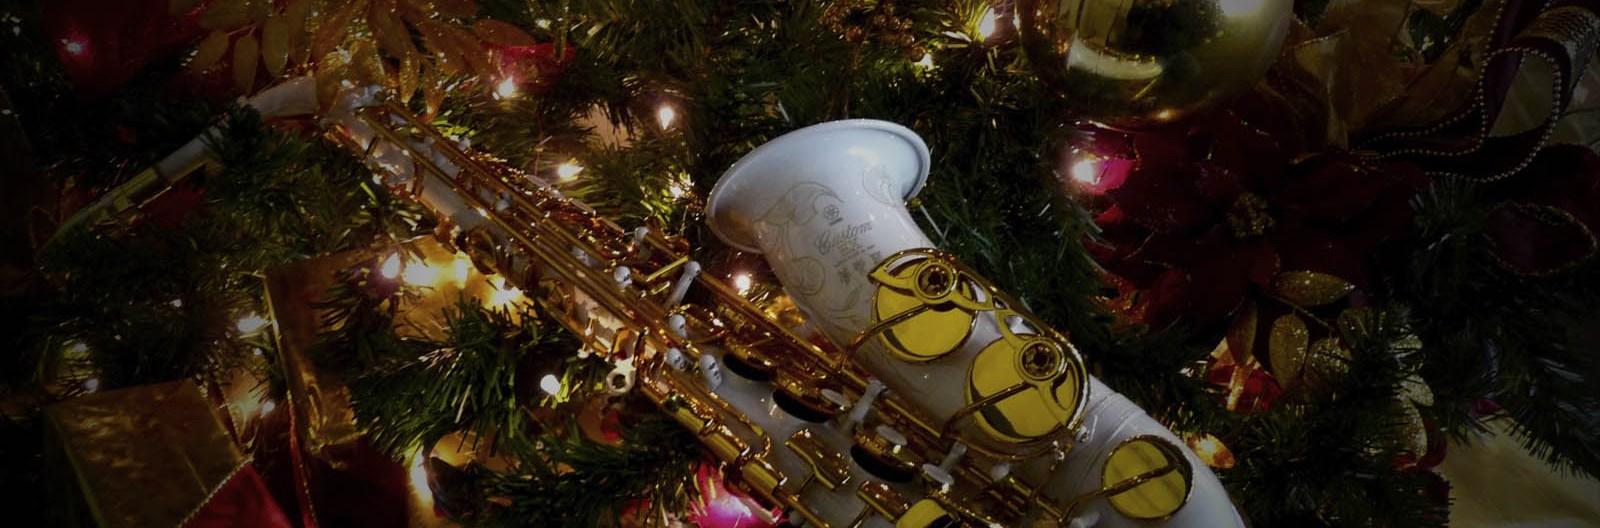 Christmas Cracker Concert 2017